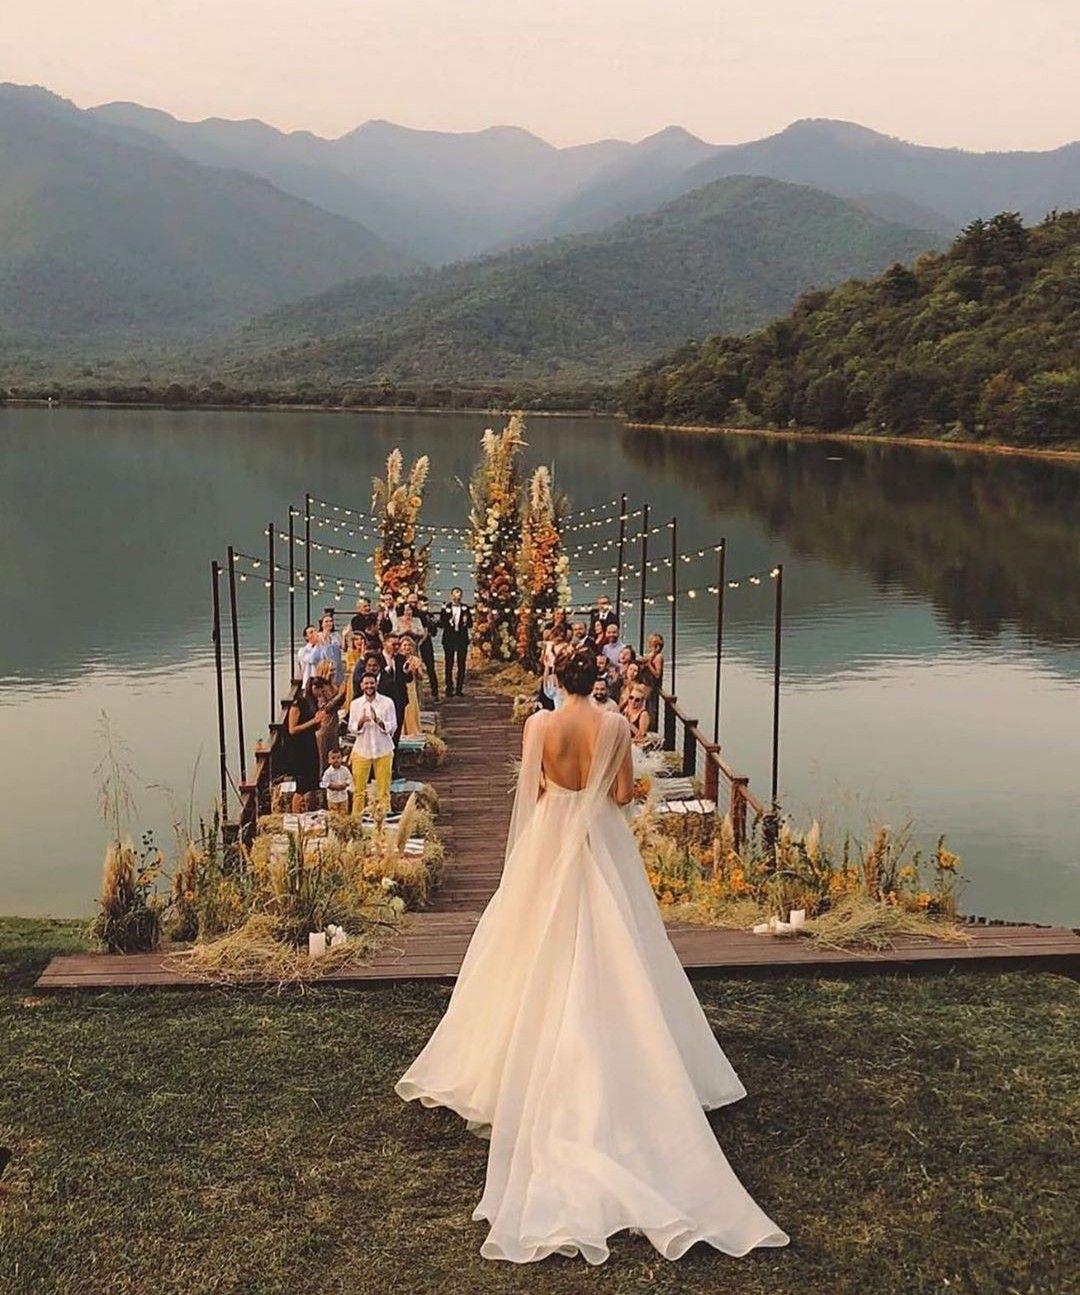 Lake Wedding Ideas: Pin By Bridalwish On Inspirational Wedding Ideas In 2020